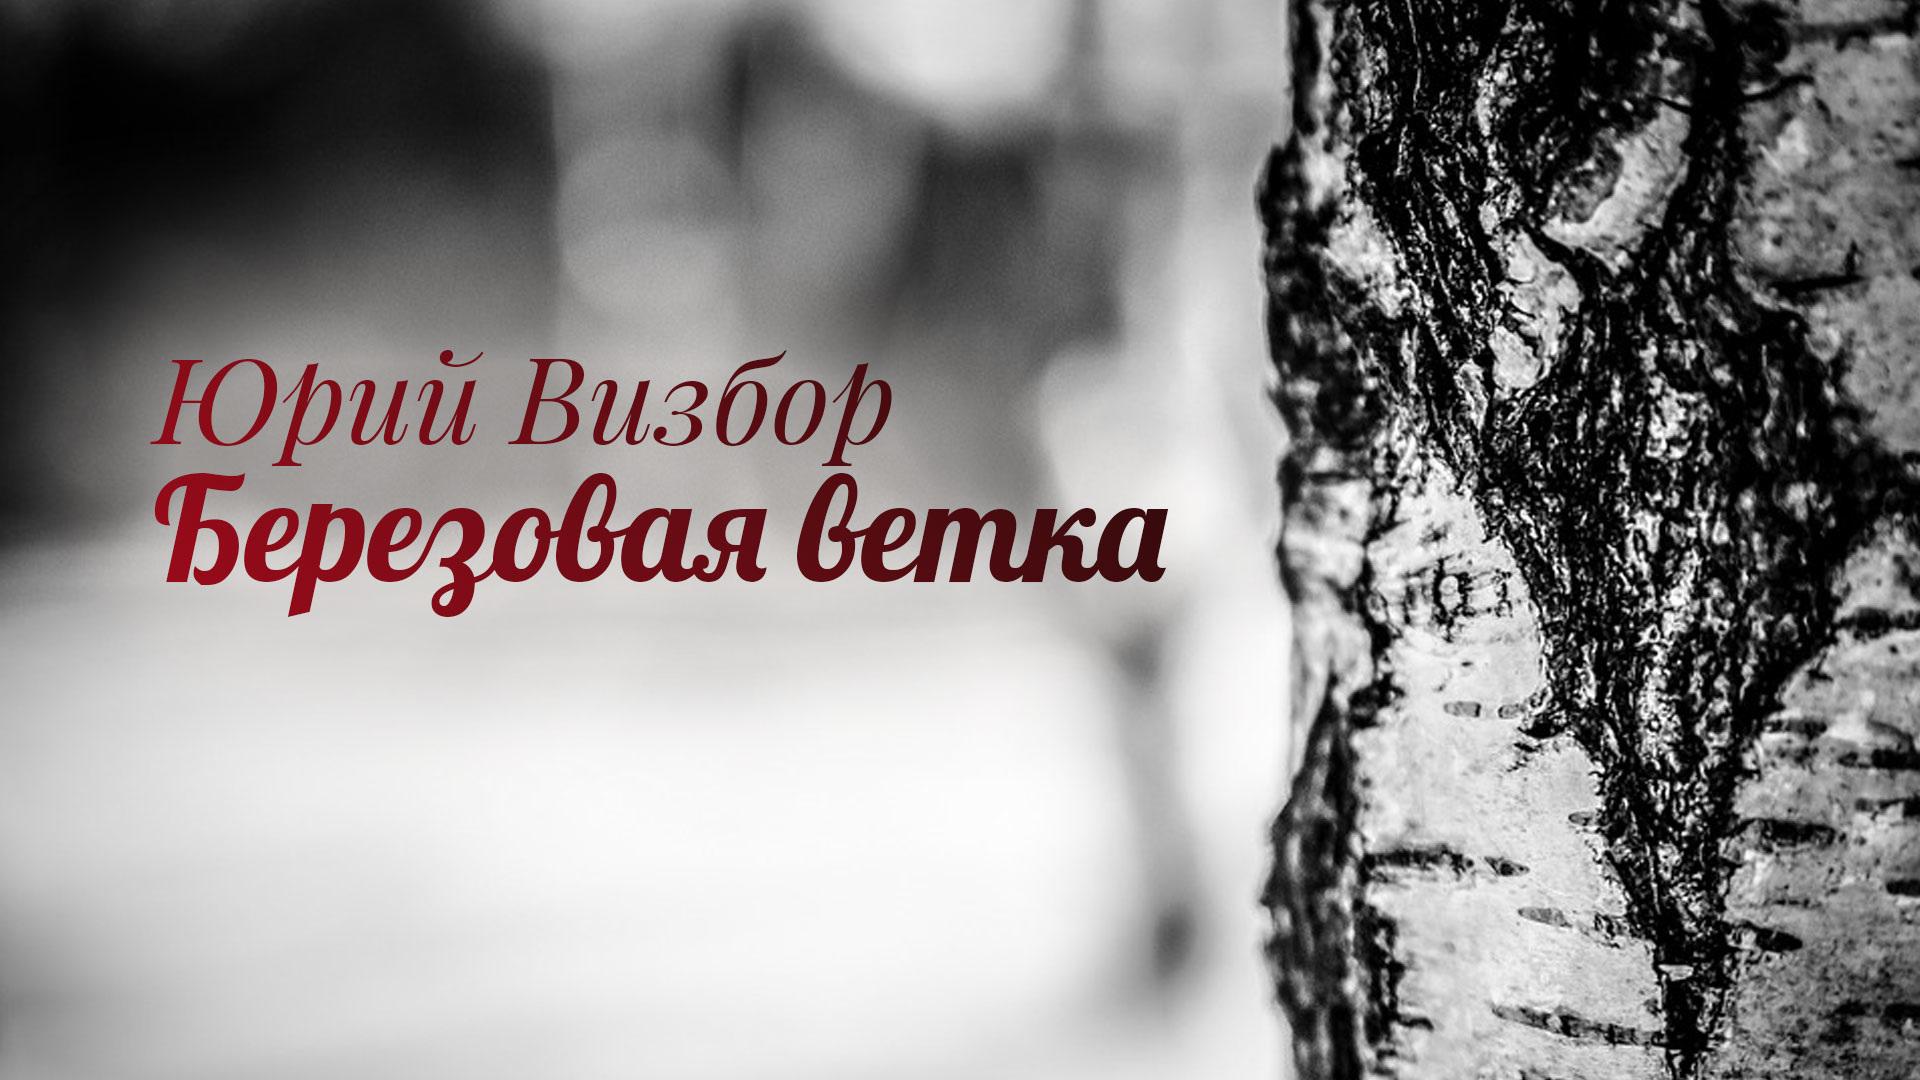 Юрий Визбор. Березовая ветка